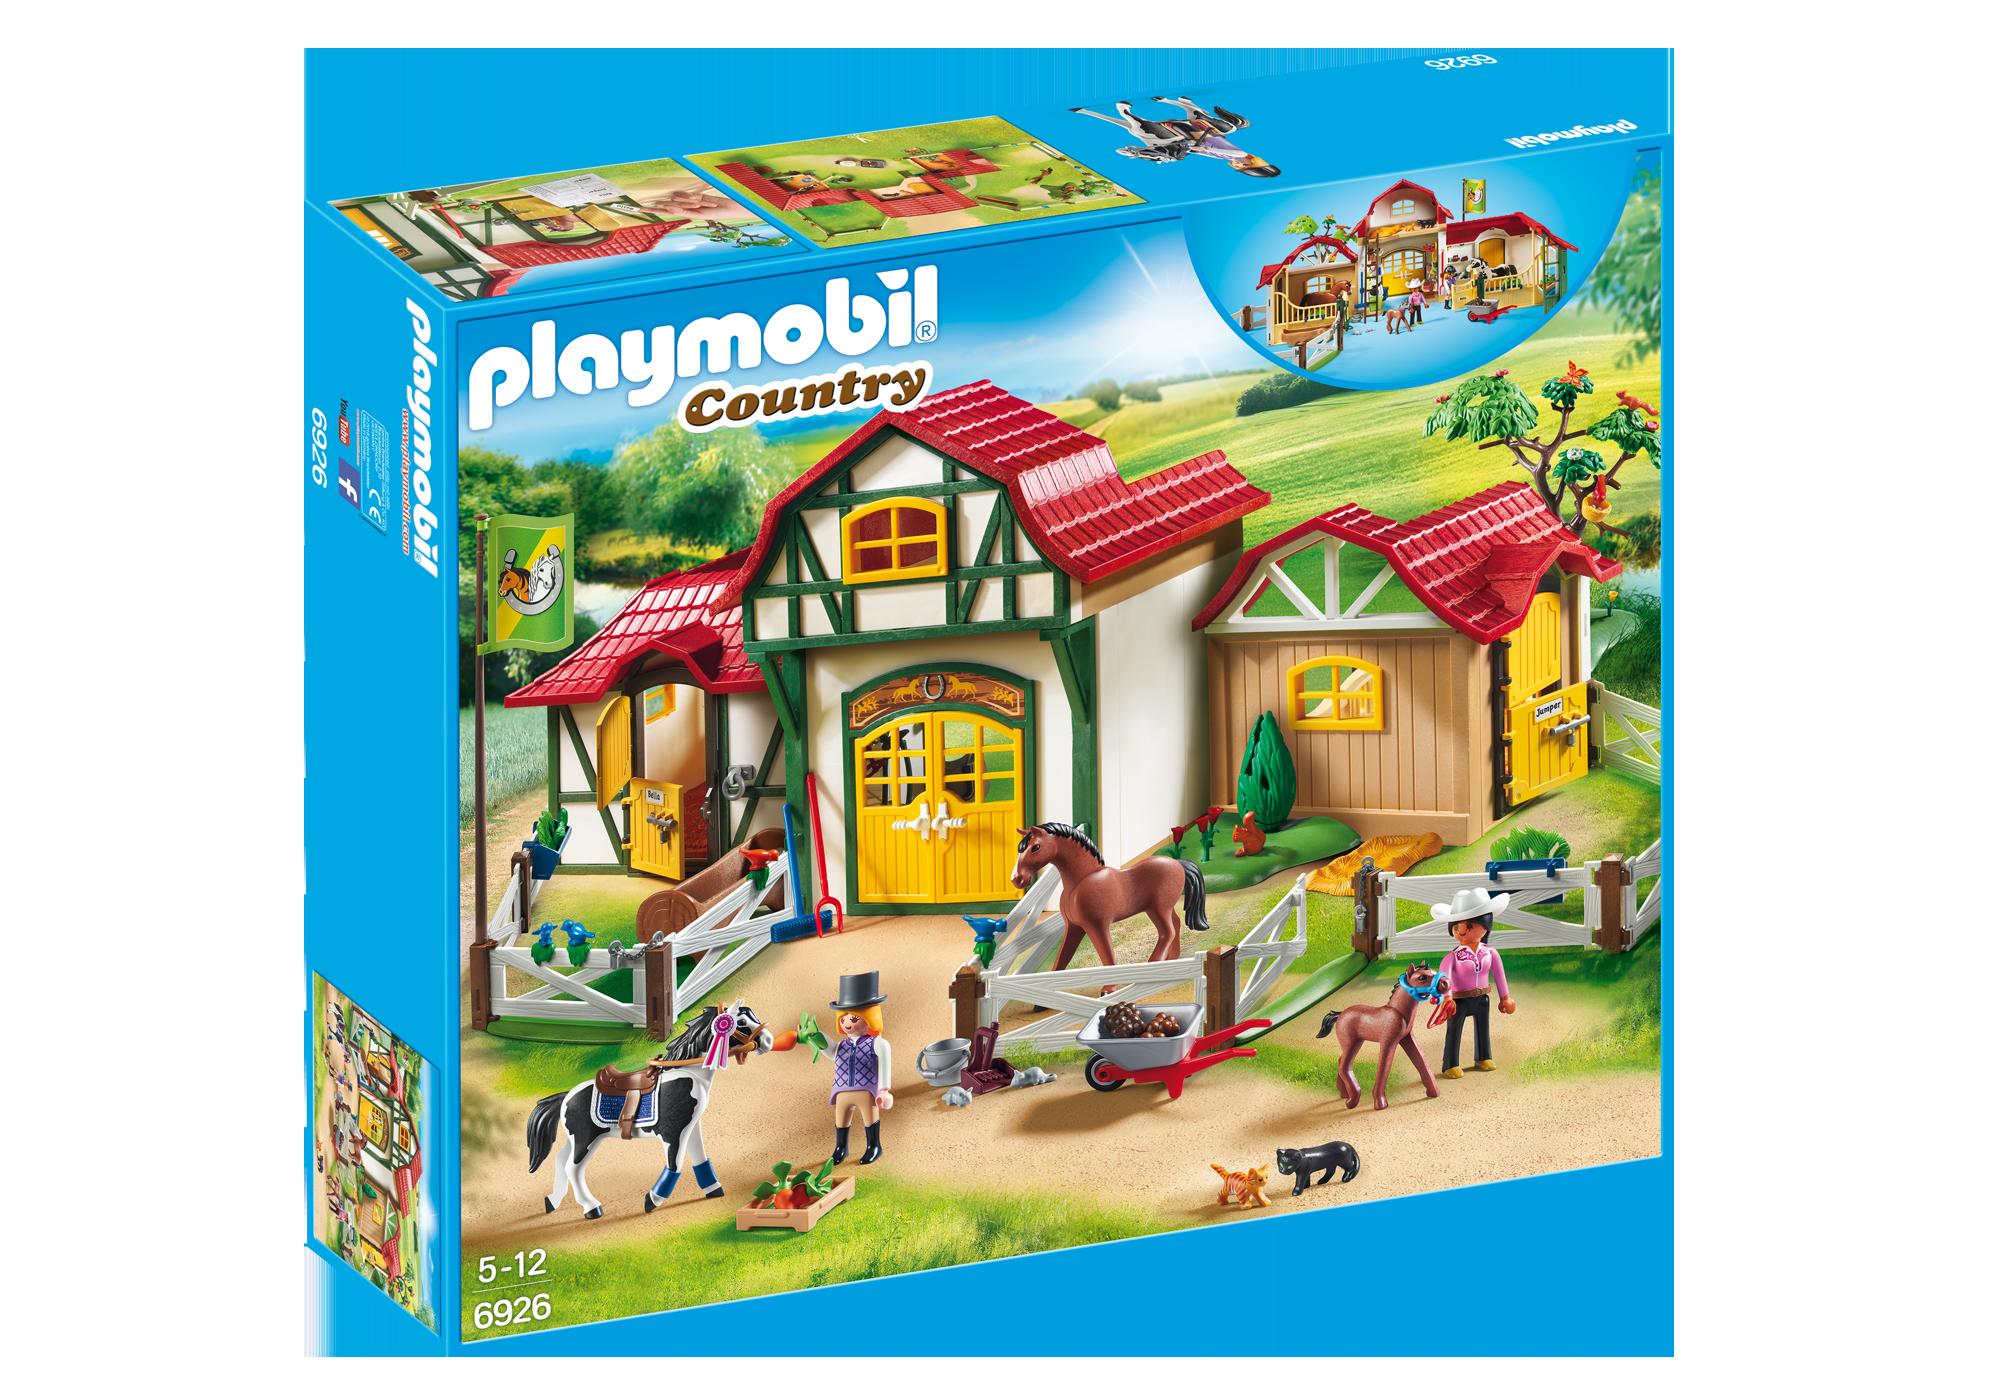 http://media.playmobil.com/i/playmobil/6926_product_box_front